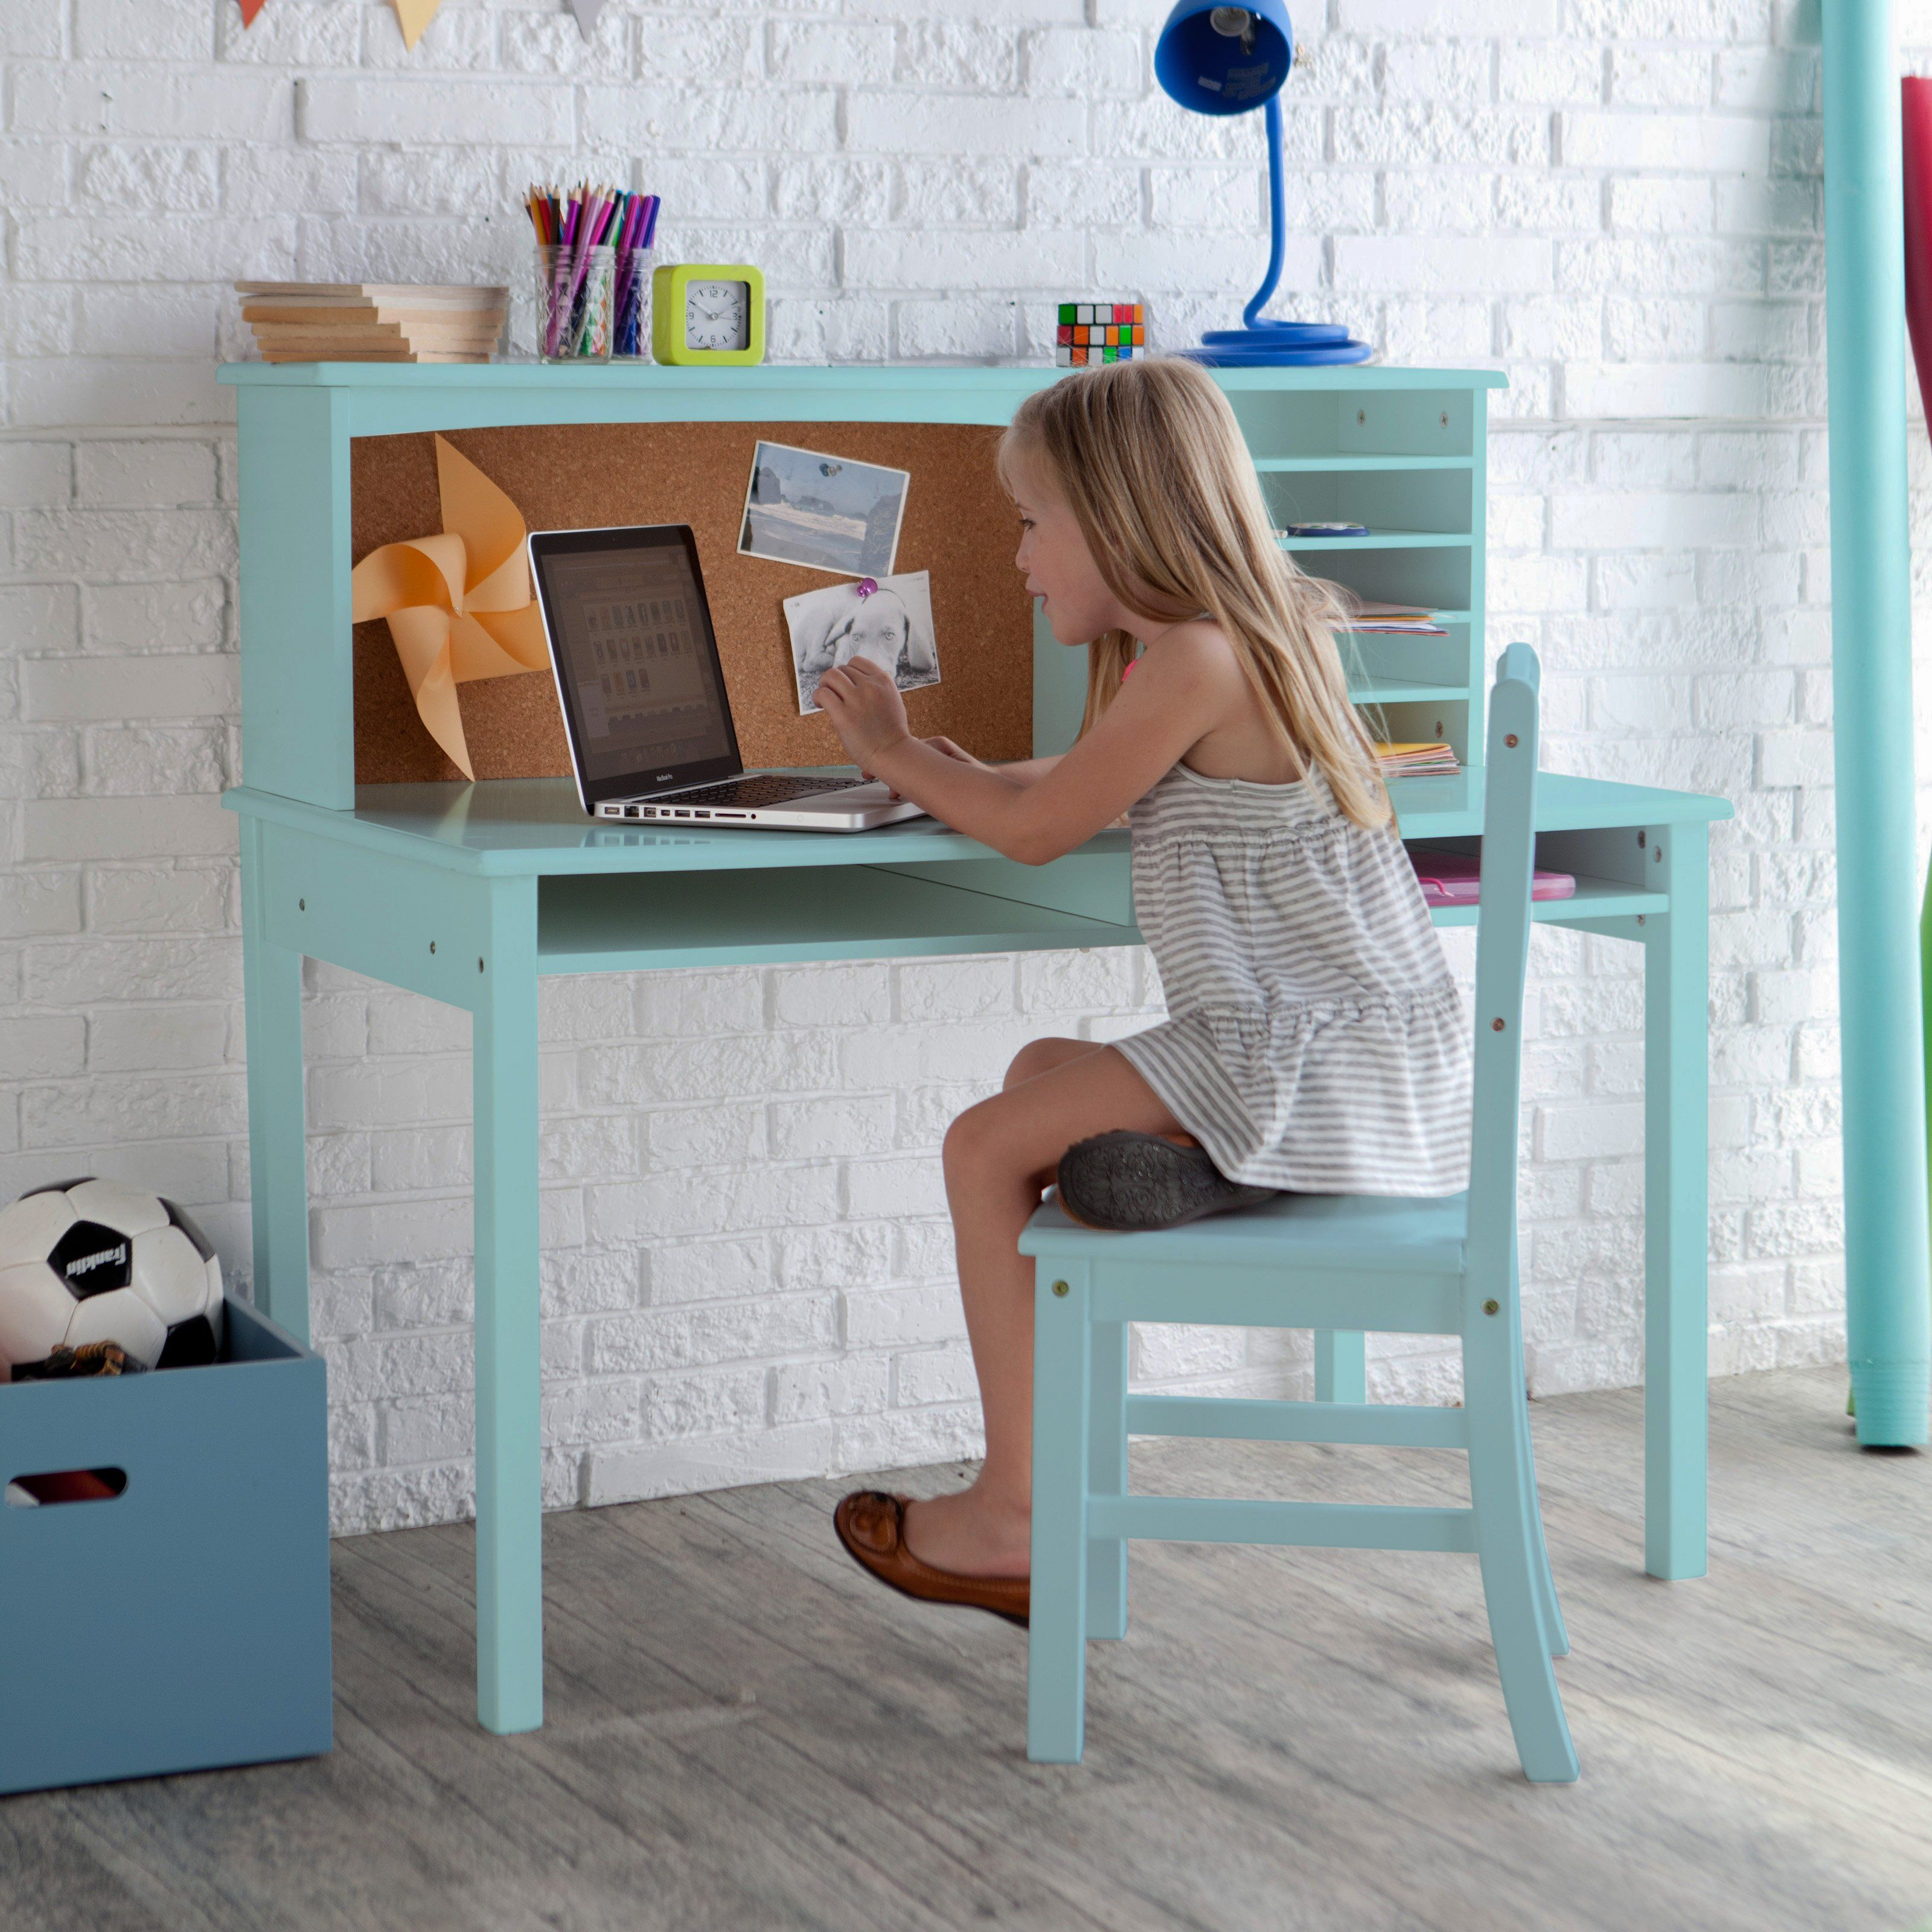 Guidecraft Media Desk & Chair Set Teal from hayneedle